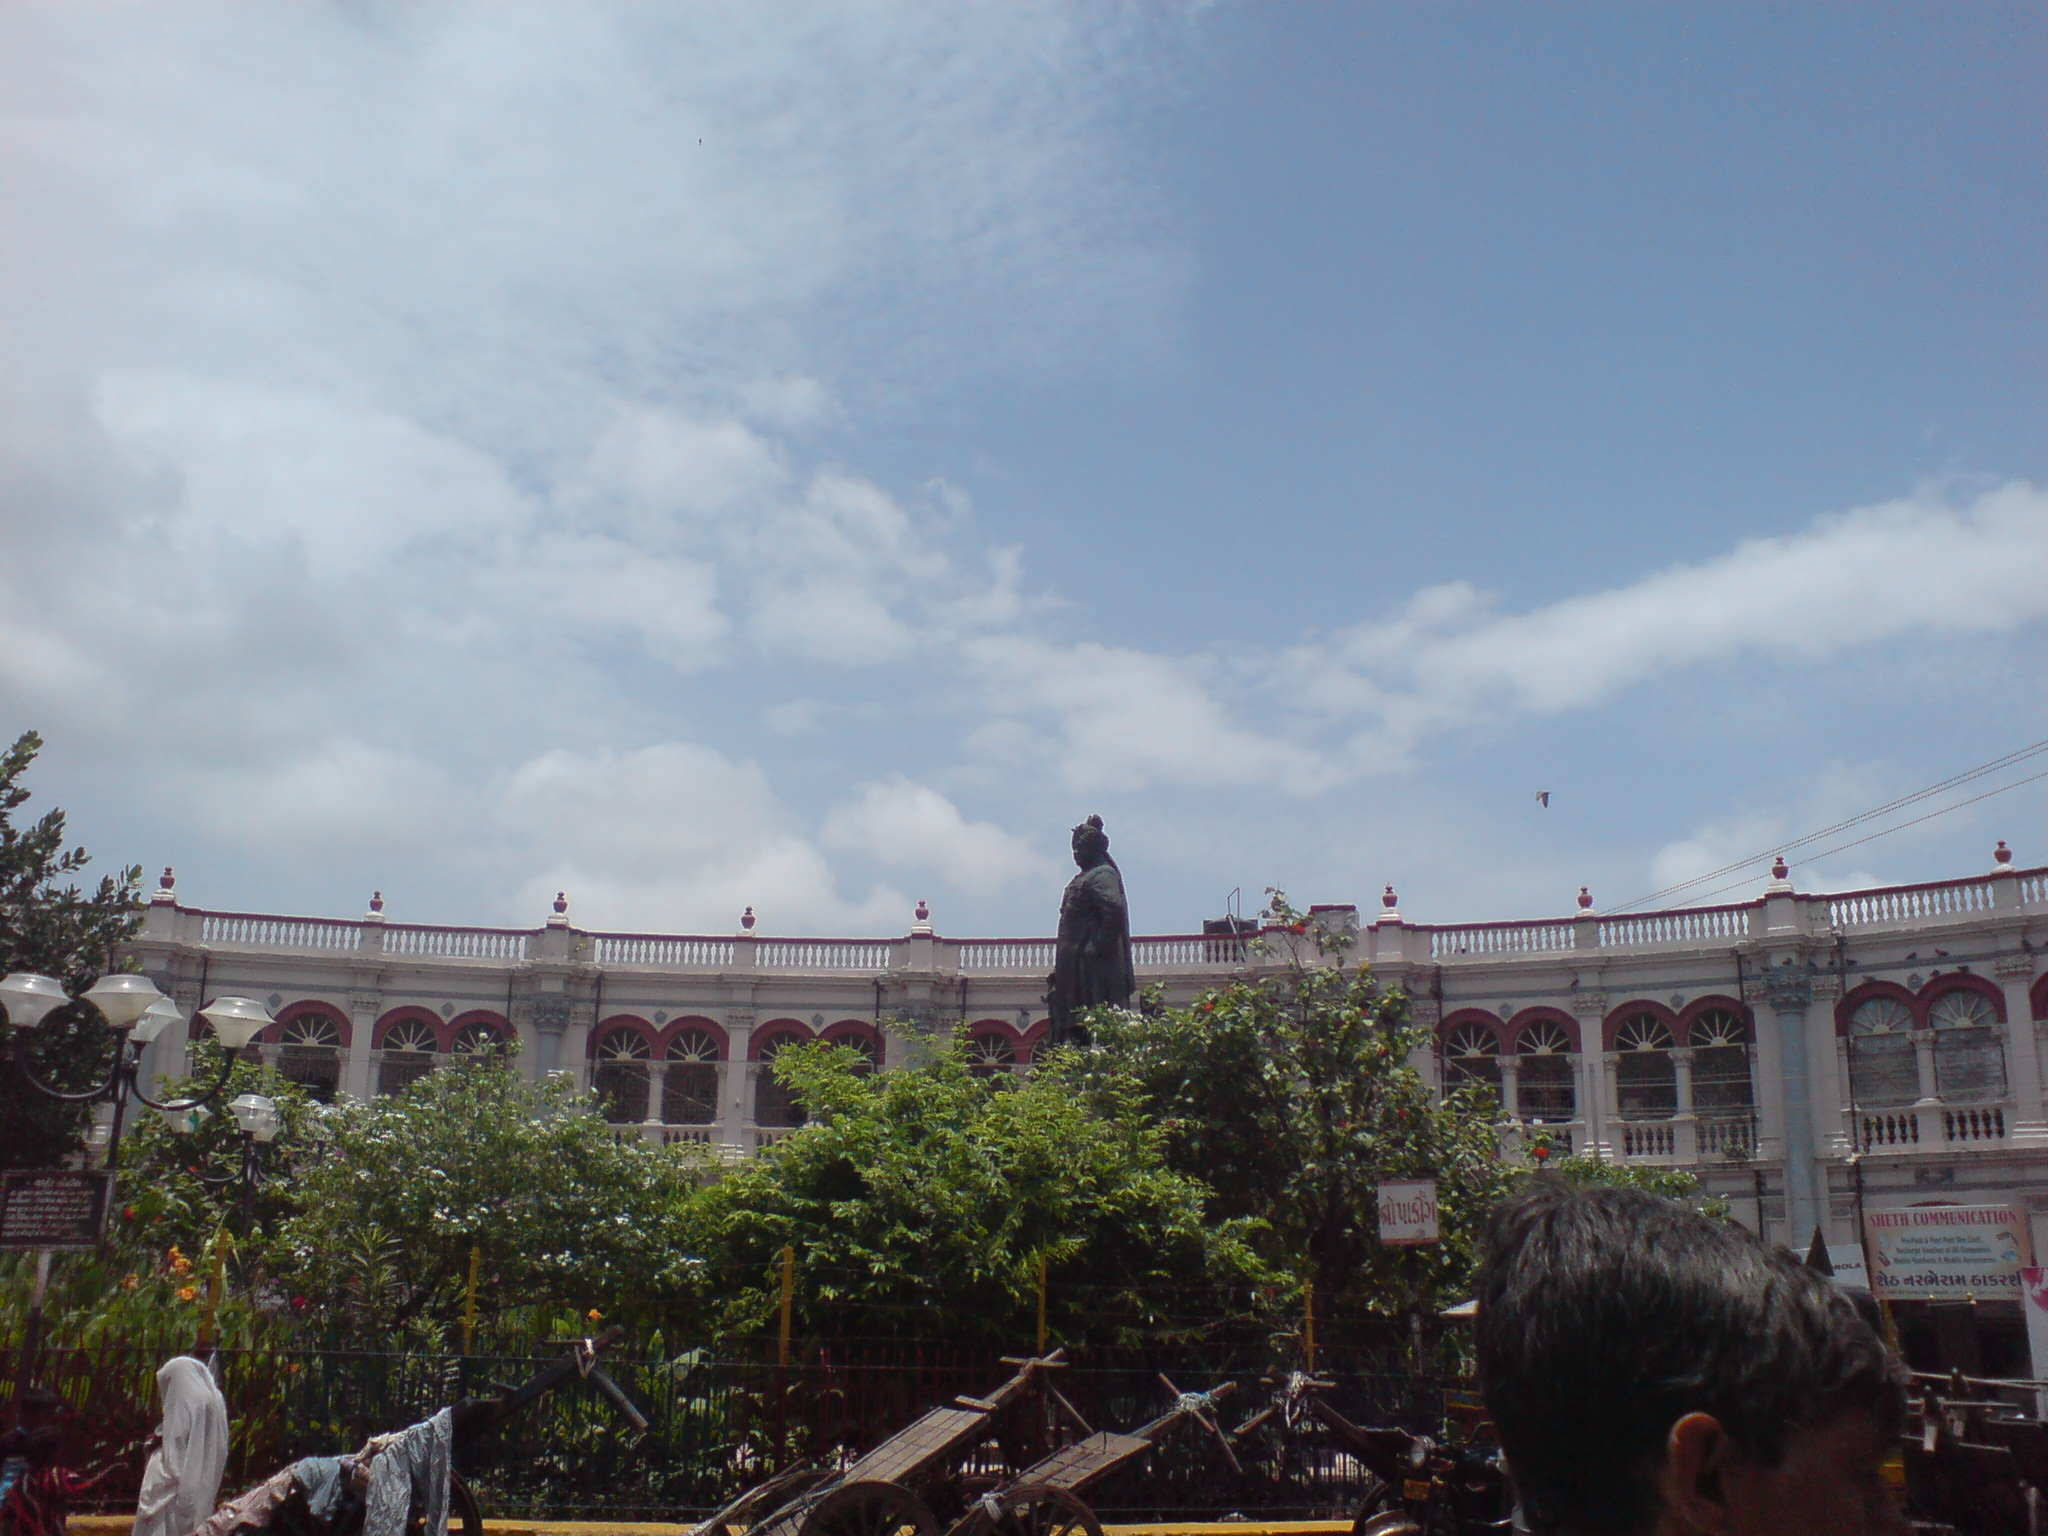 Darbargadh1